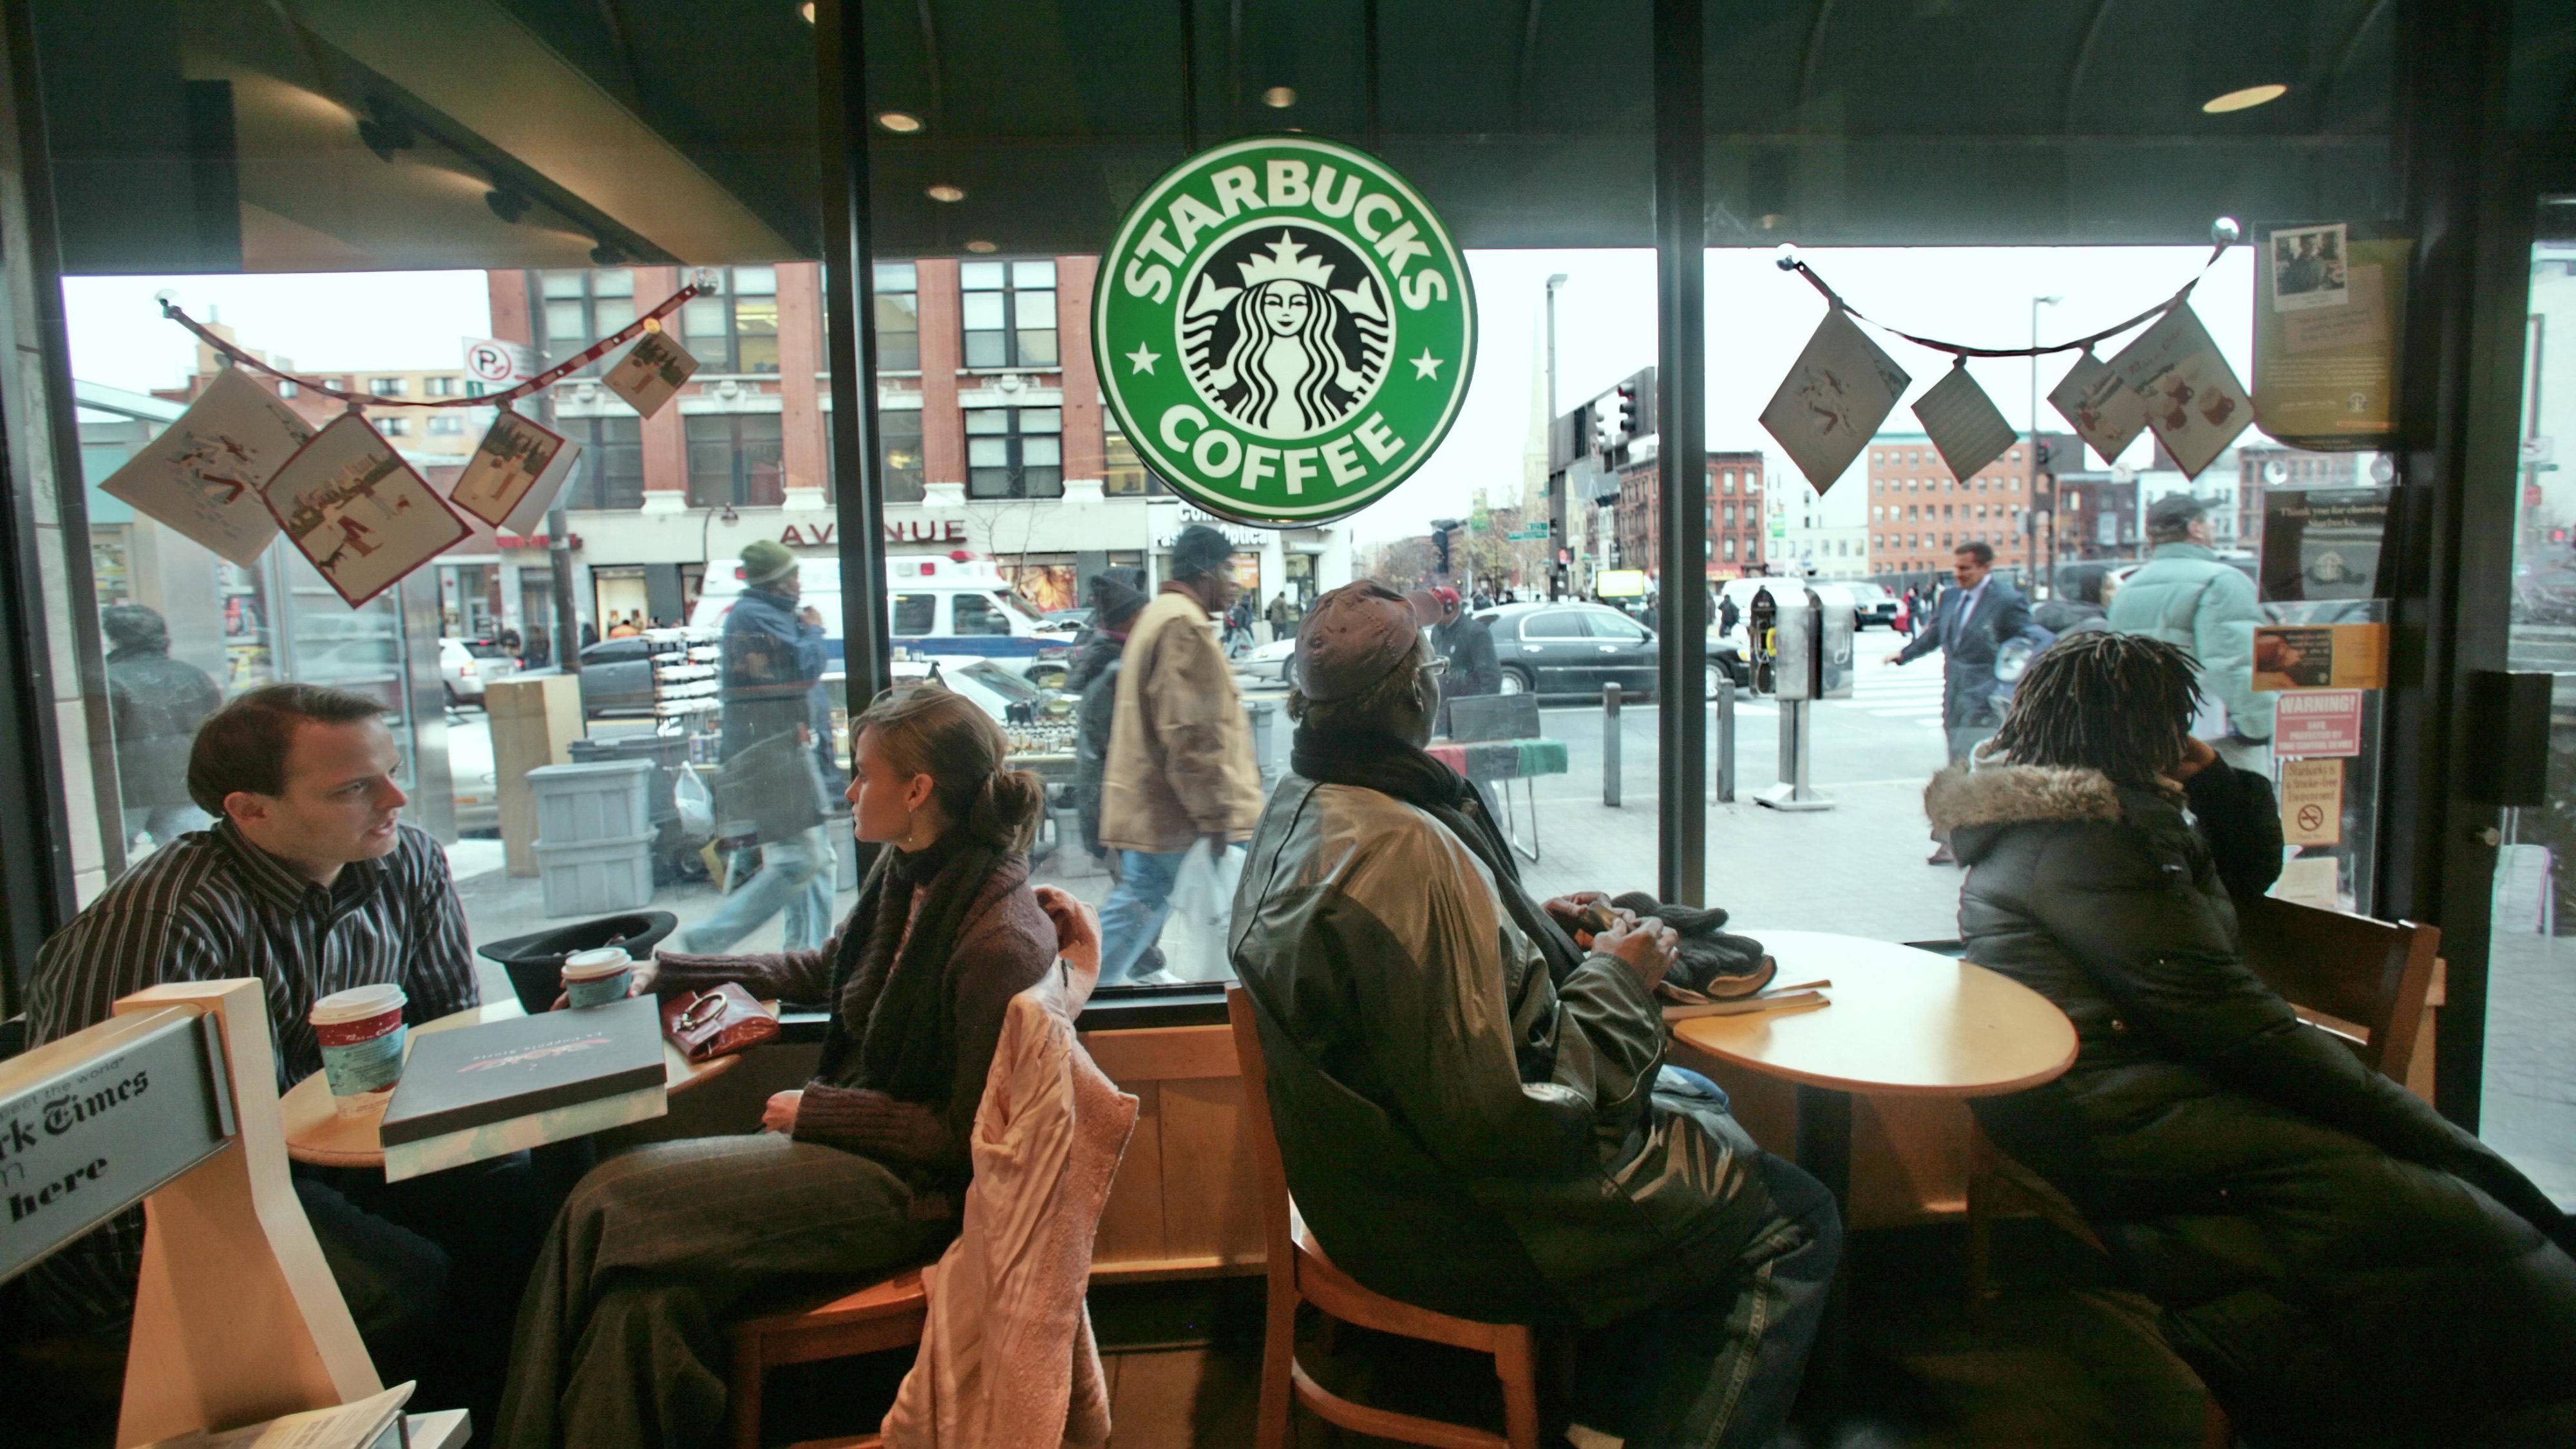 Confirmed Starbucks Knows The Next Hot Neighborhood